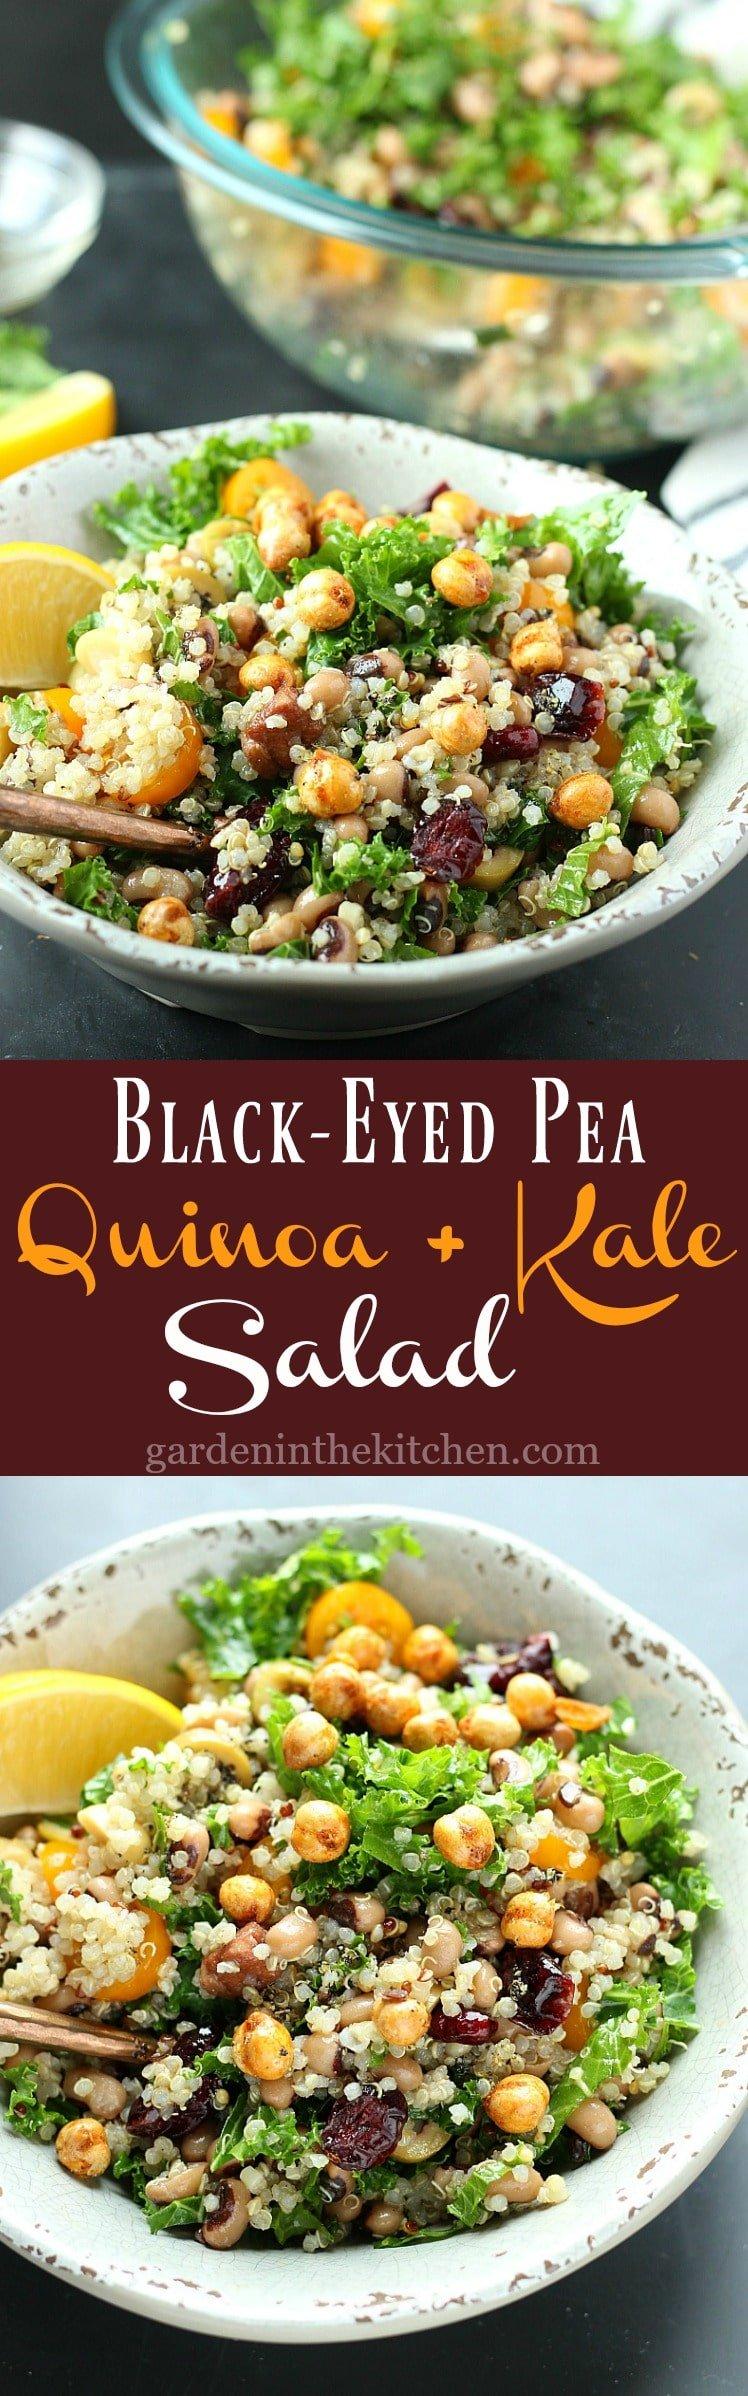 Black-Eyed Pea Quinoa + Kale Salad | Garden in the Kitchen